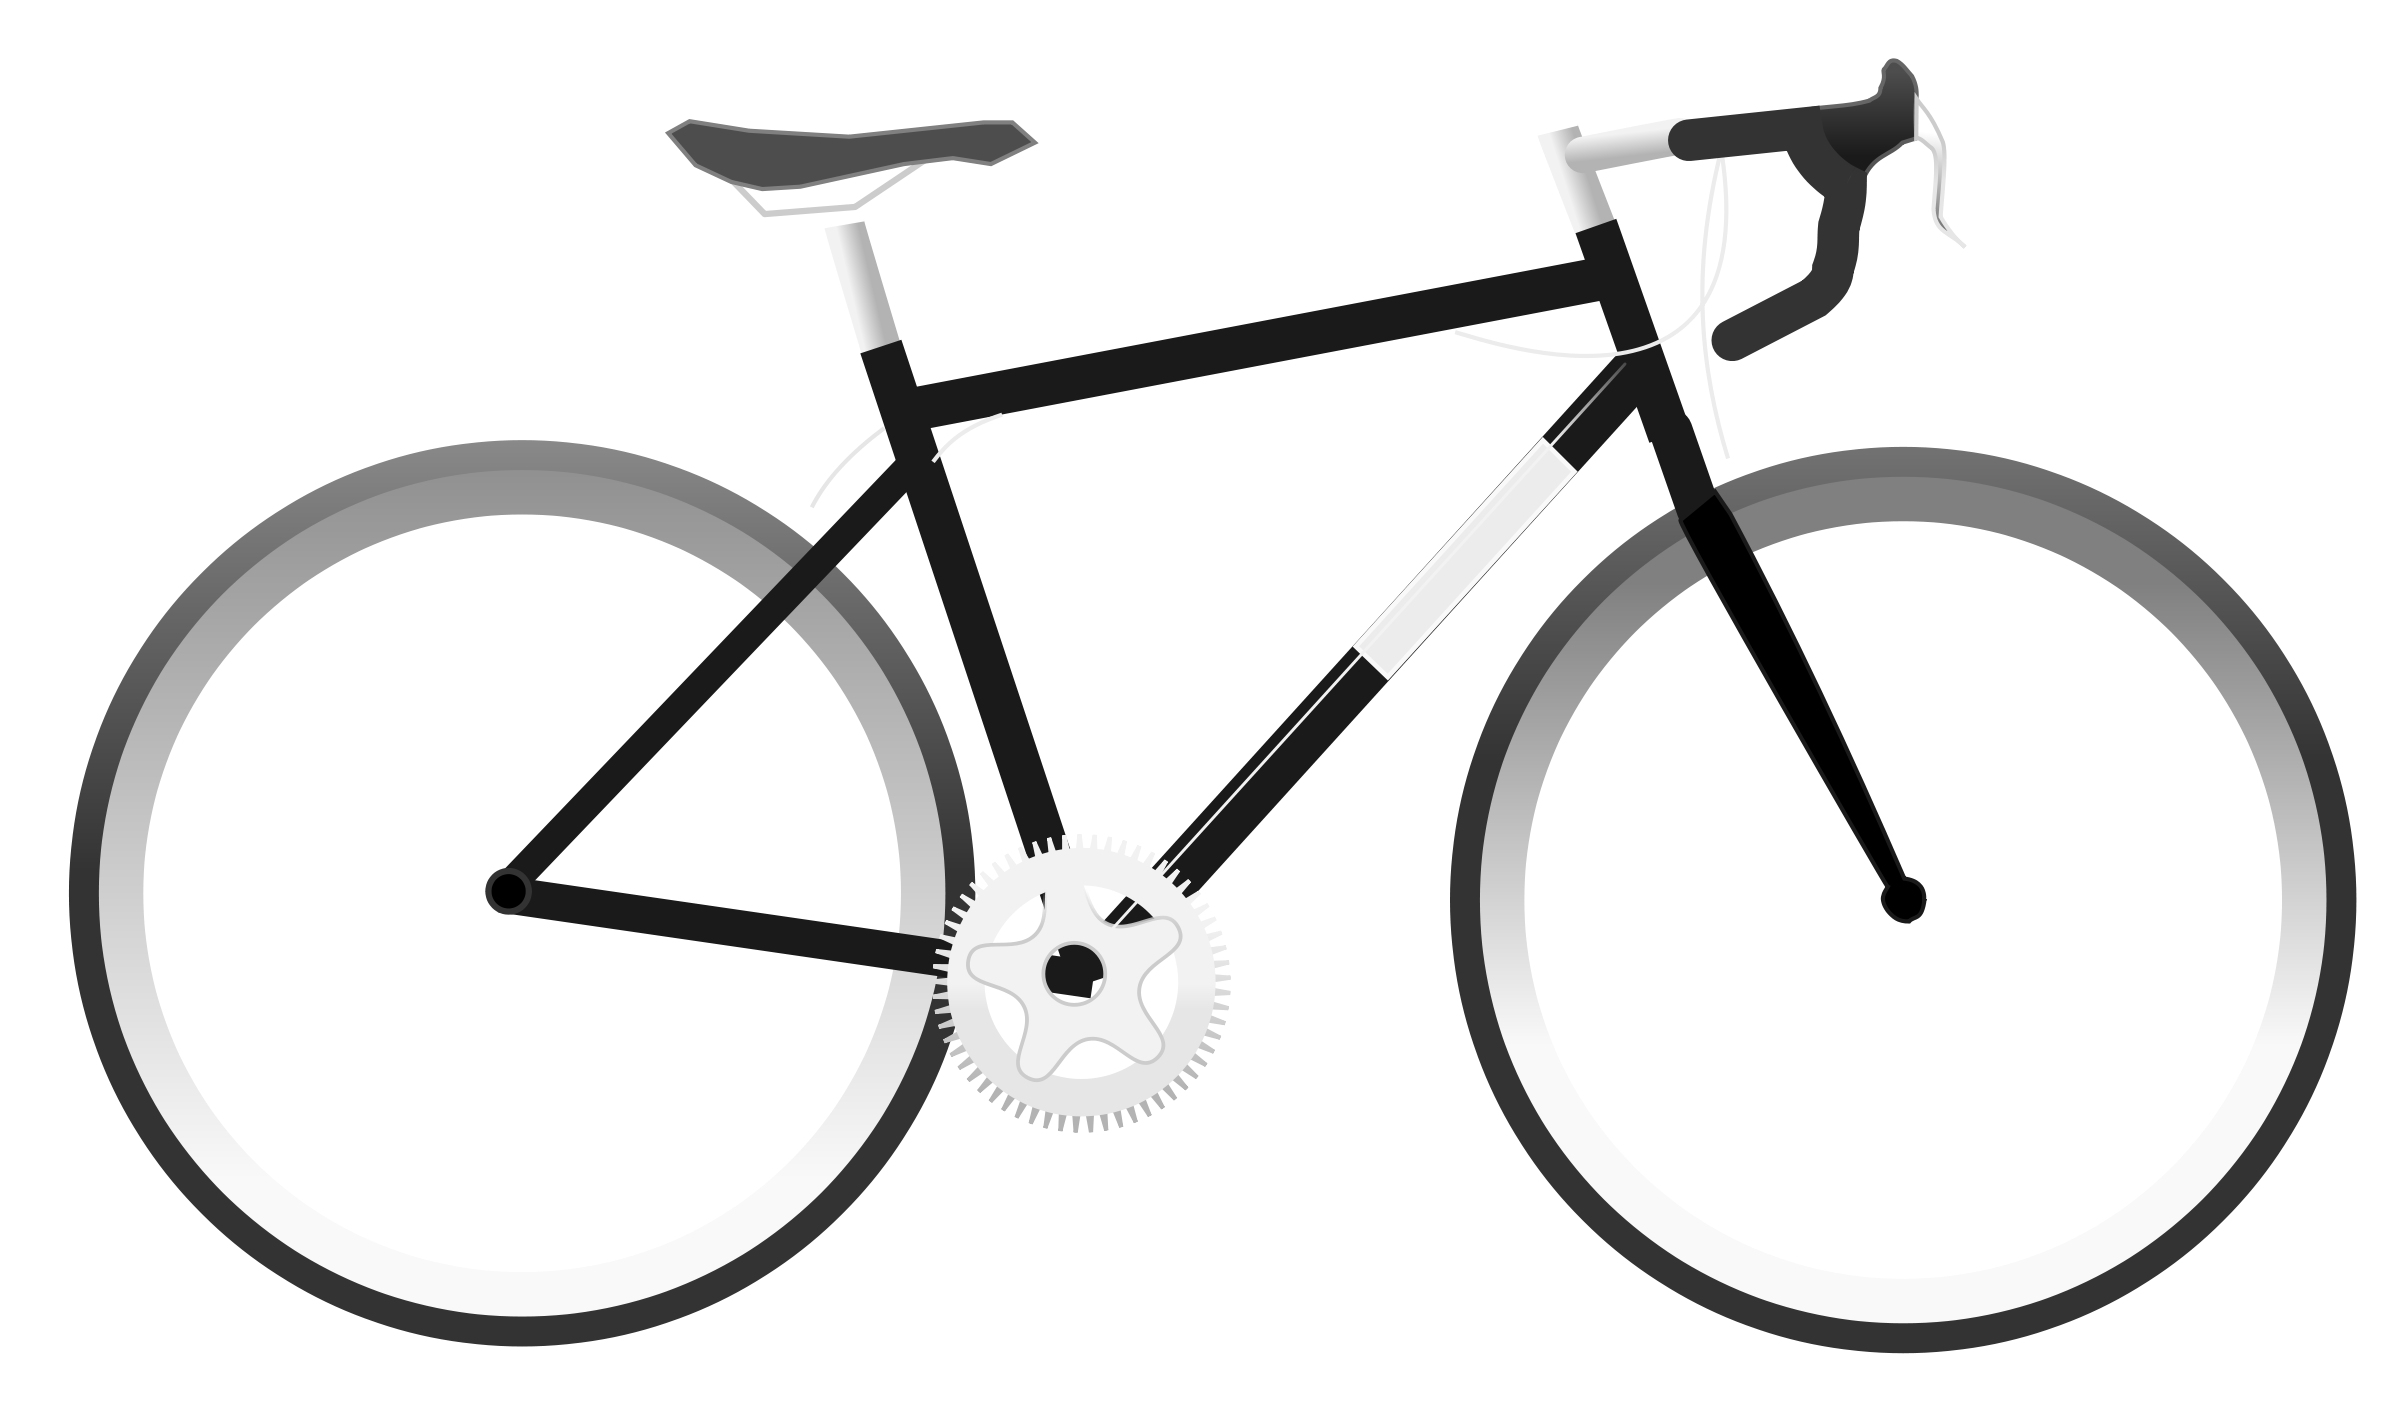 2400x1410 Pushbike Clipart Bike Race